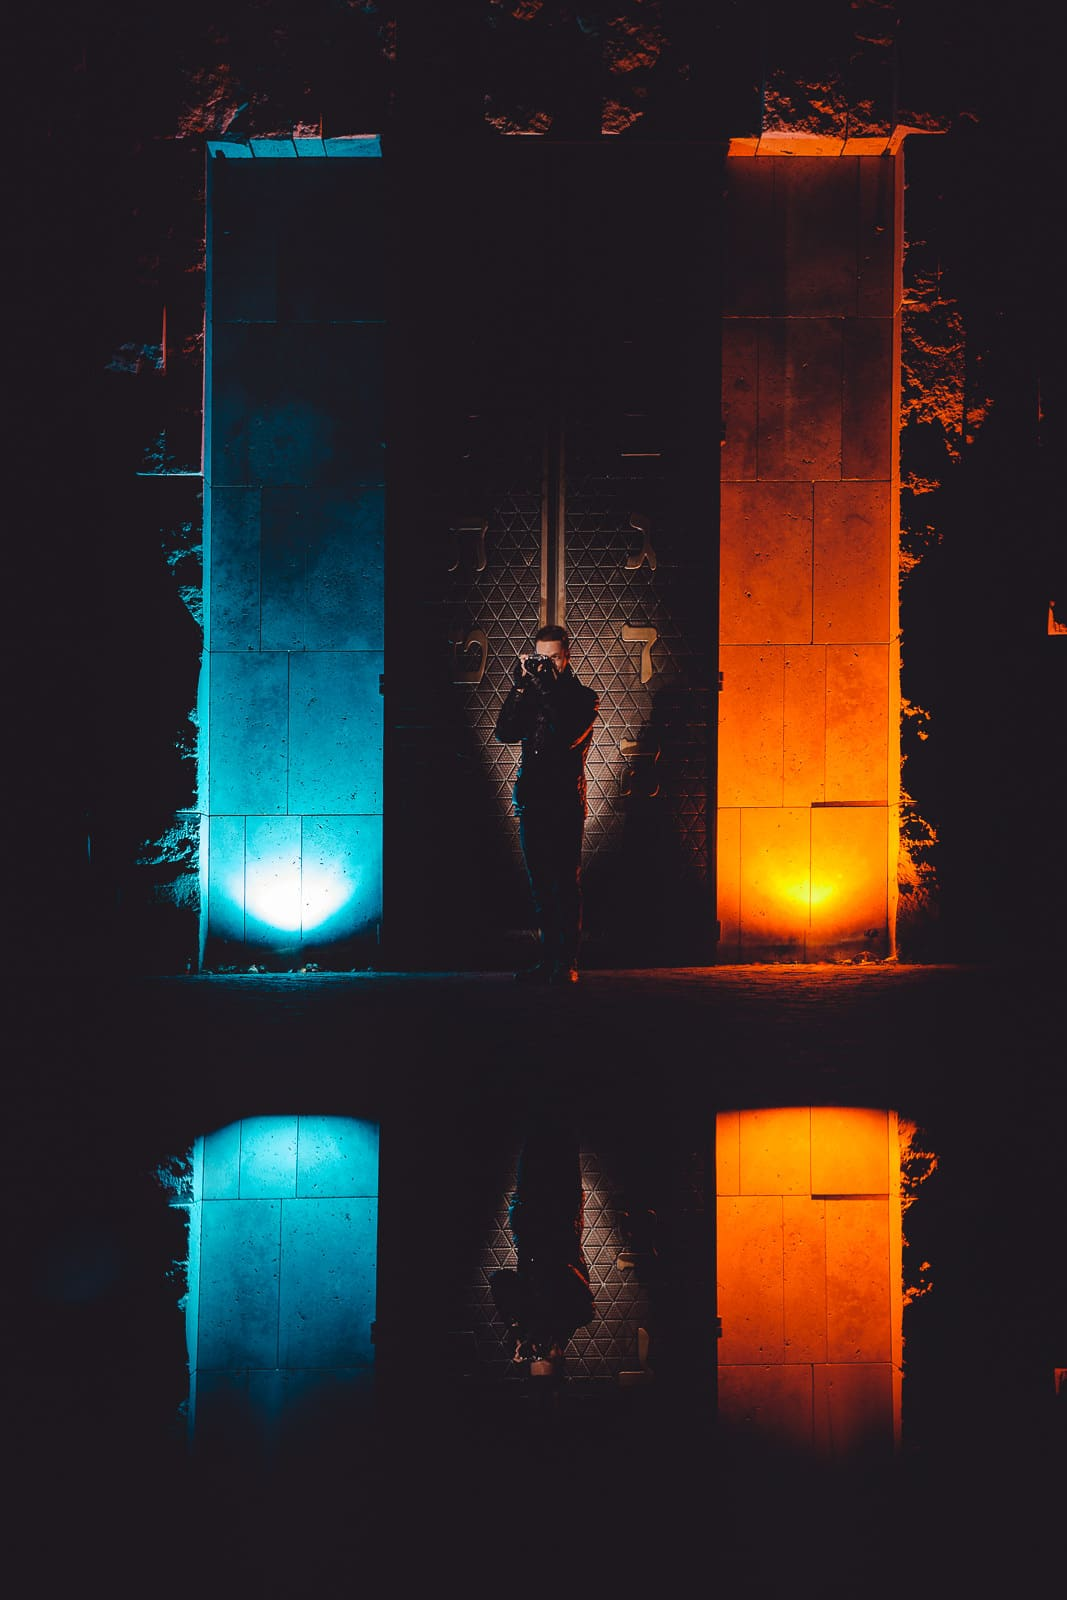 Fotowalk München - Kreative Fotografie